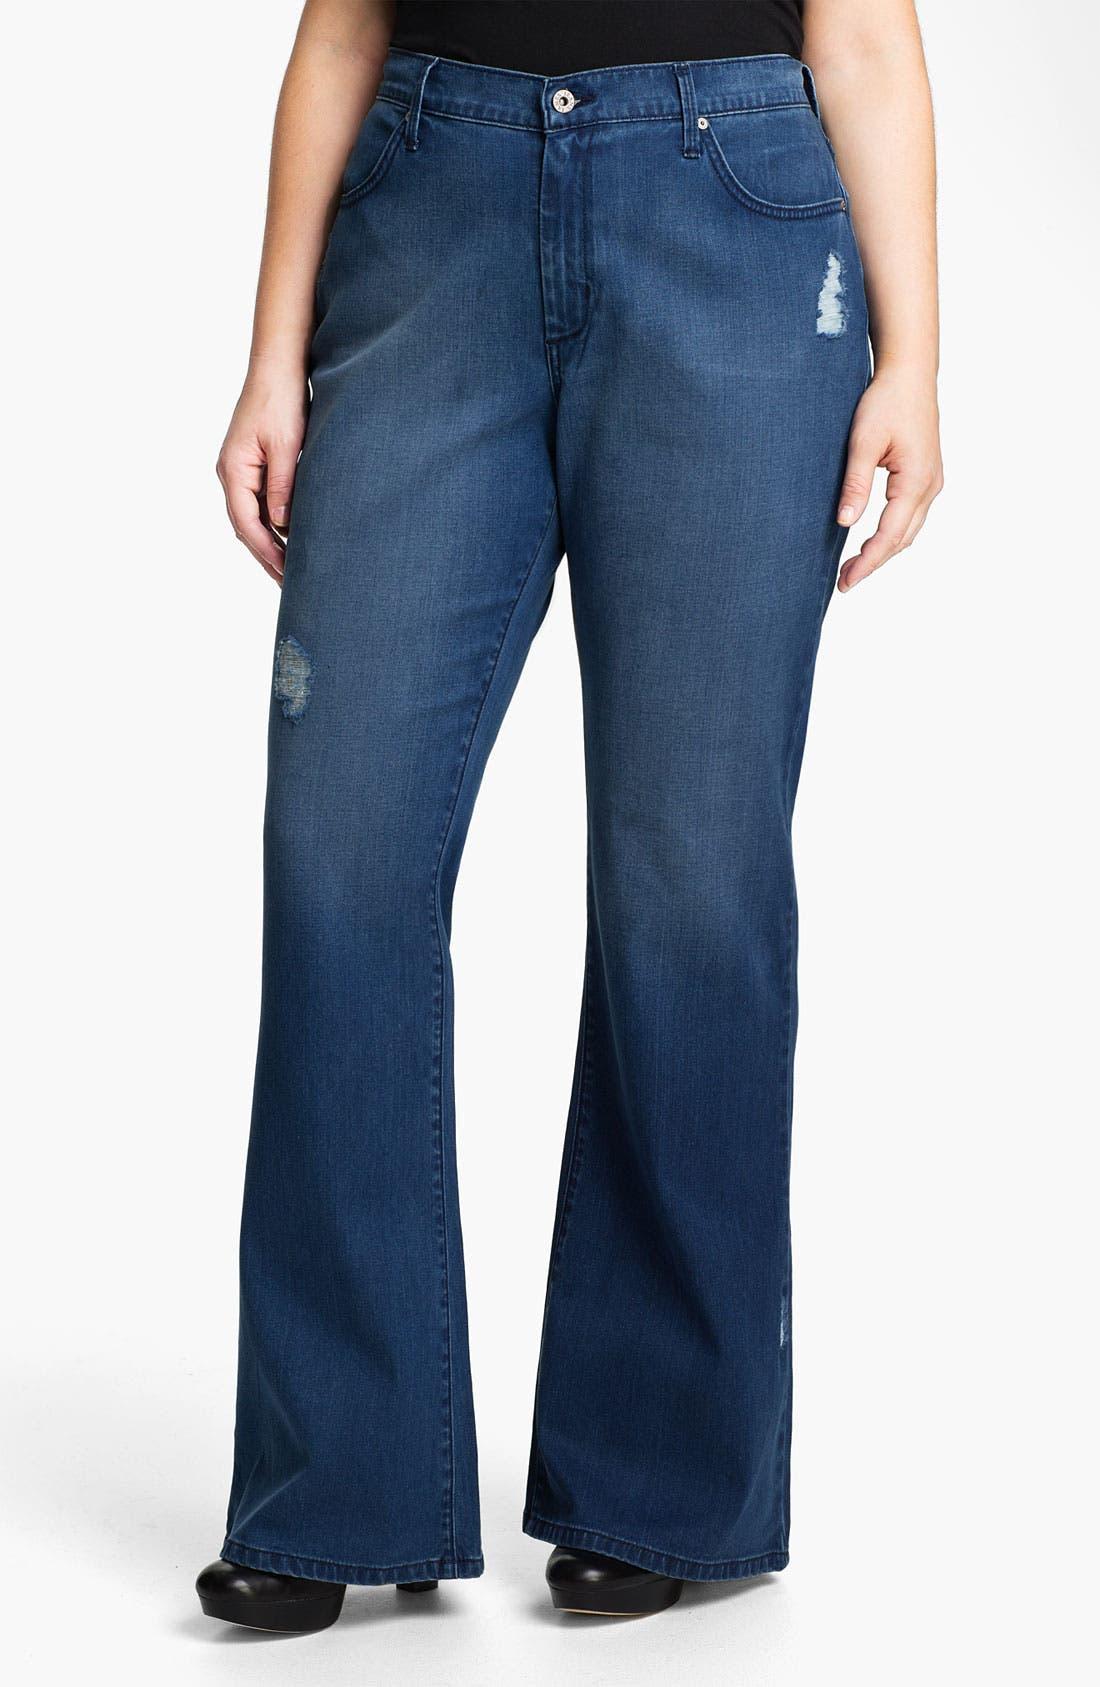 Alternate Image 1 Selected - James Jeans Broken In High Rise Flare Leg Jeans (Plus)